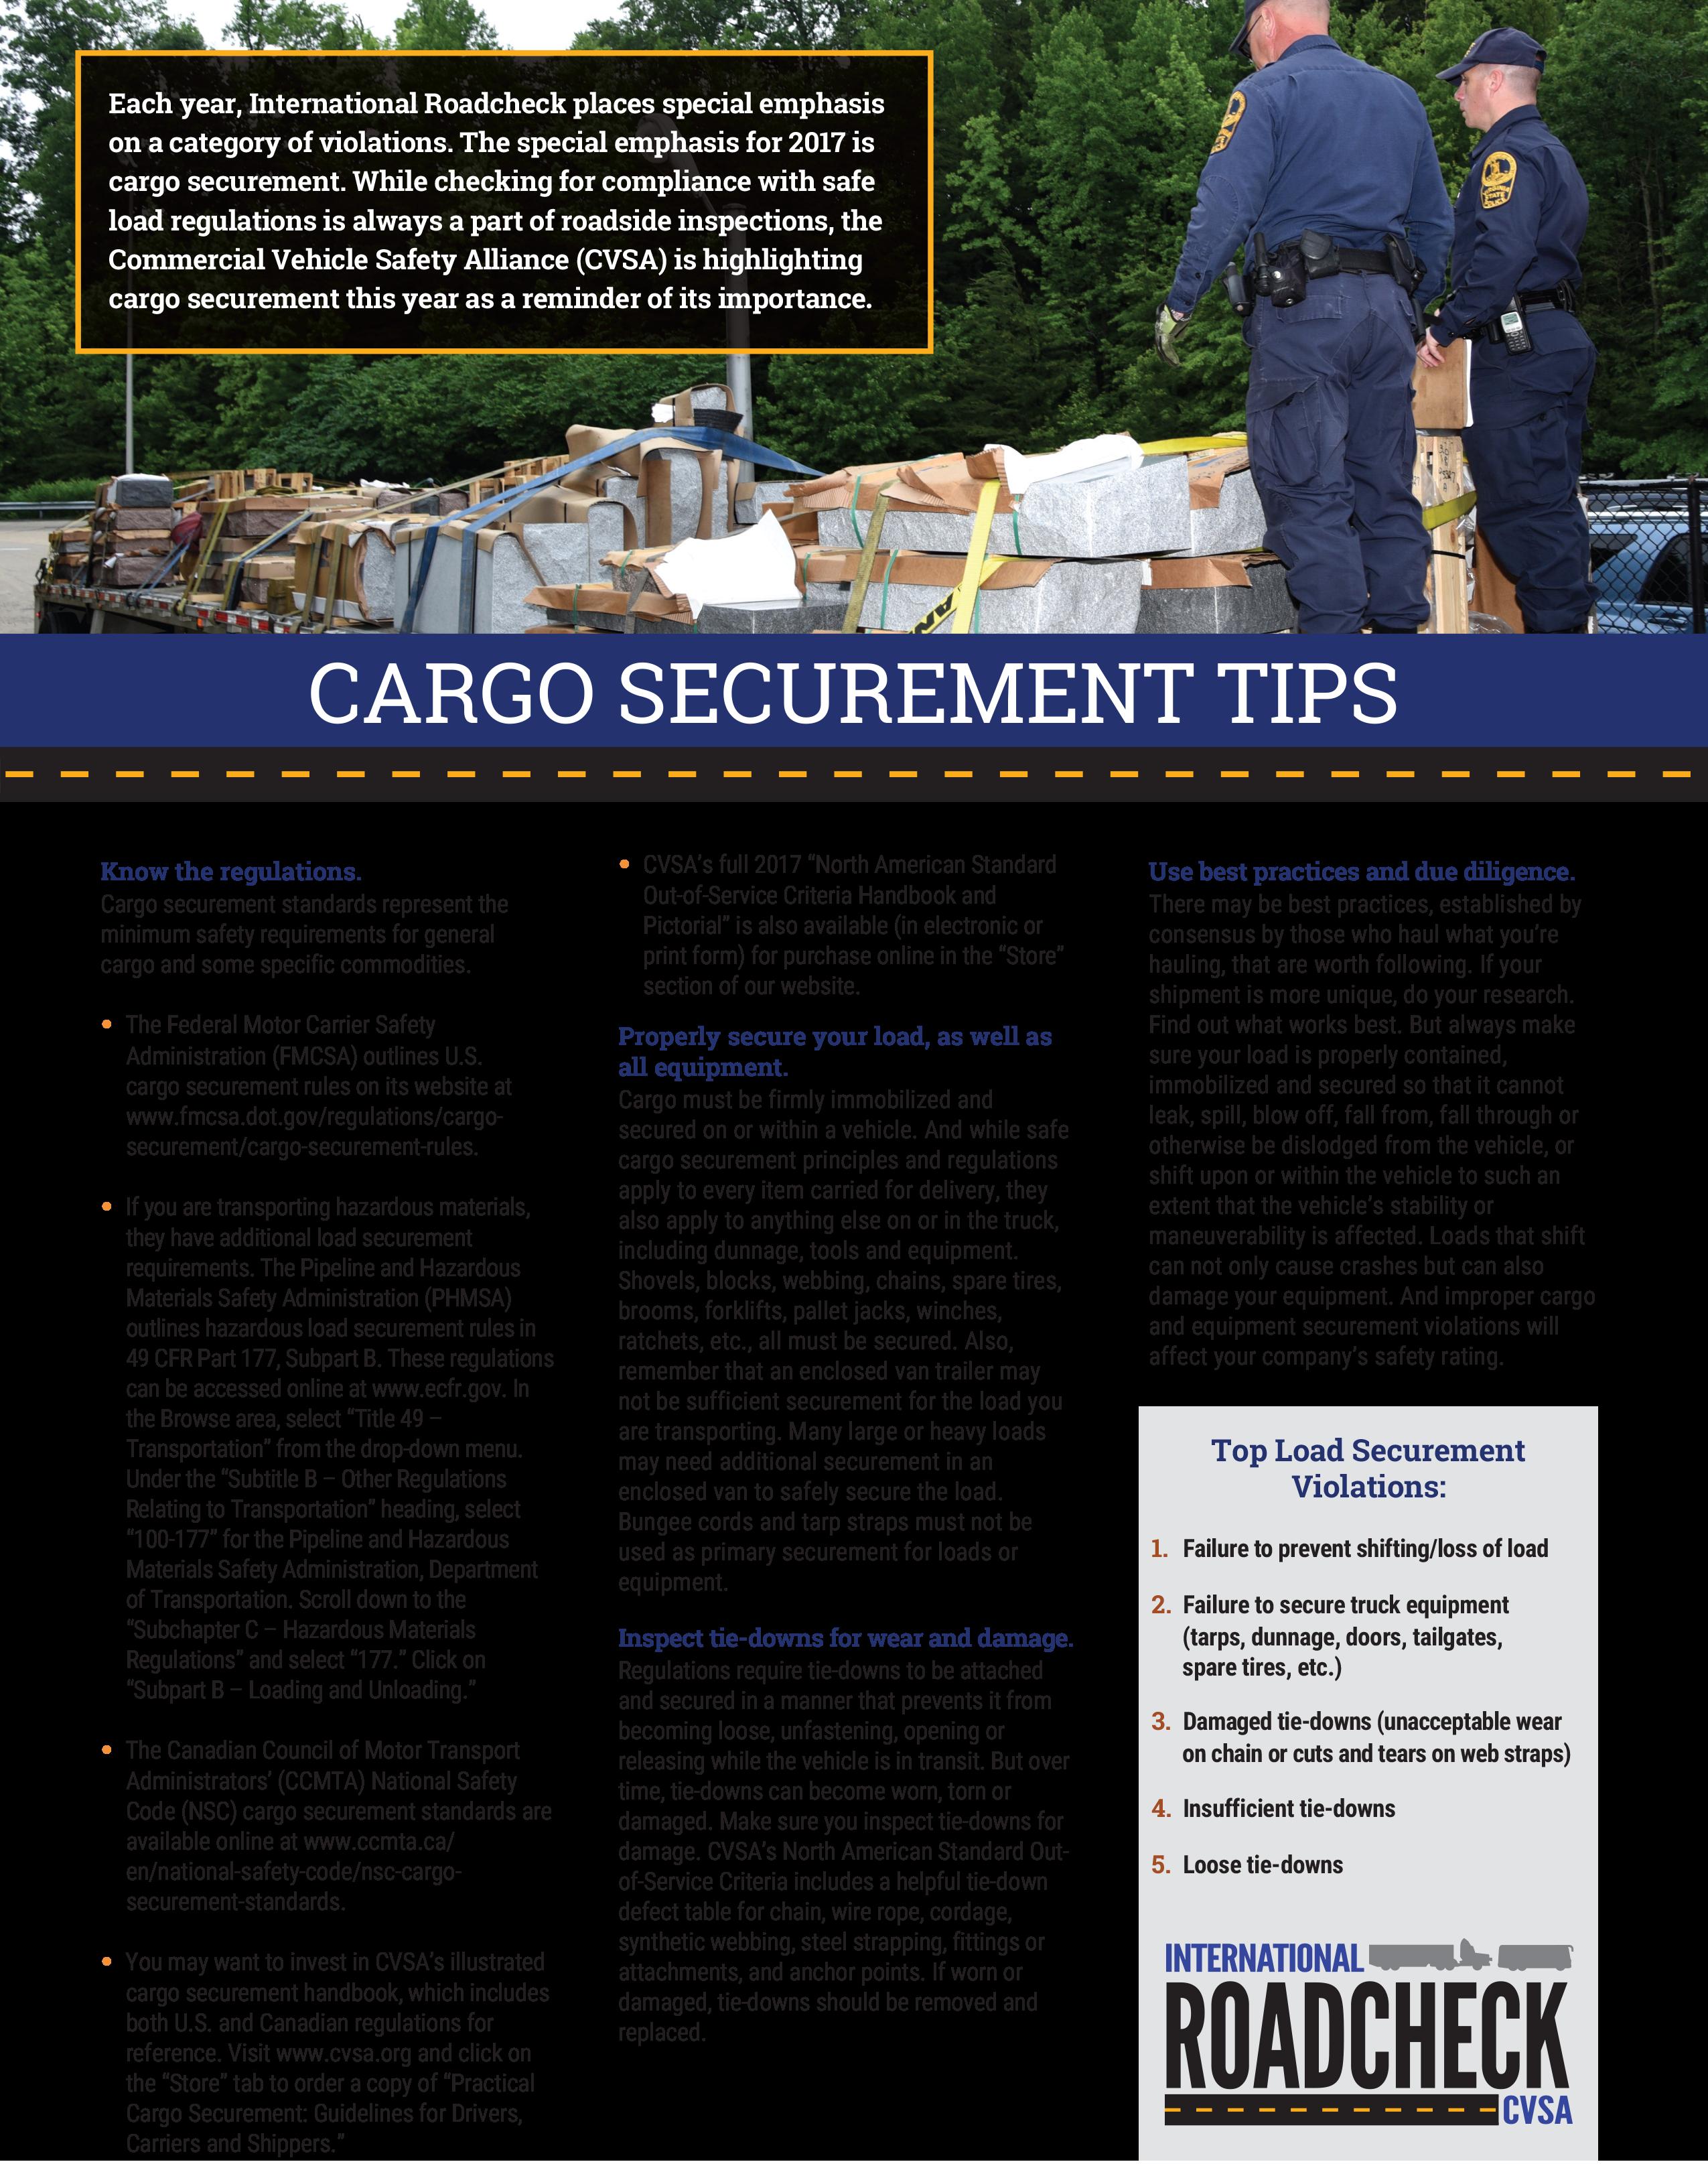 2017-CargoSecurement-Flyer-CVSA-Roadcheck-Fleet-Safety.png